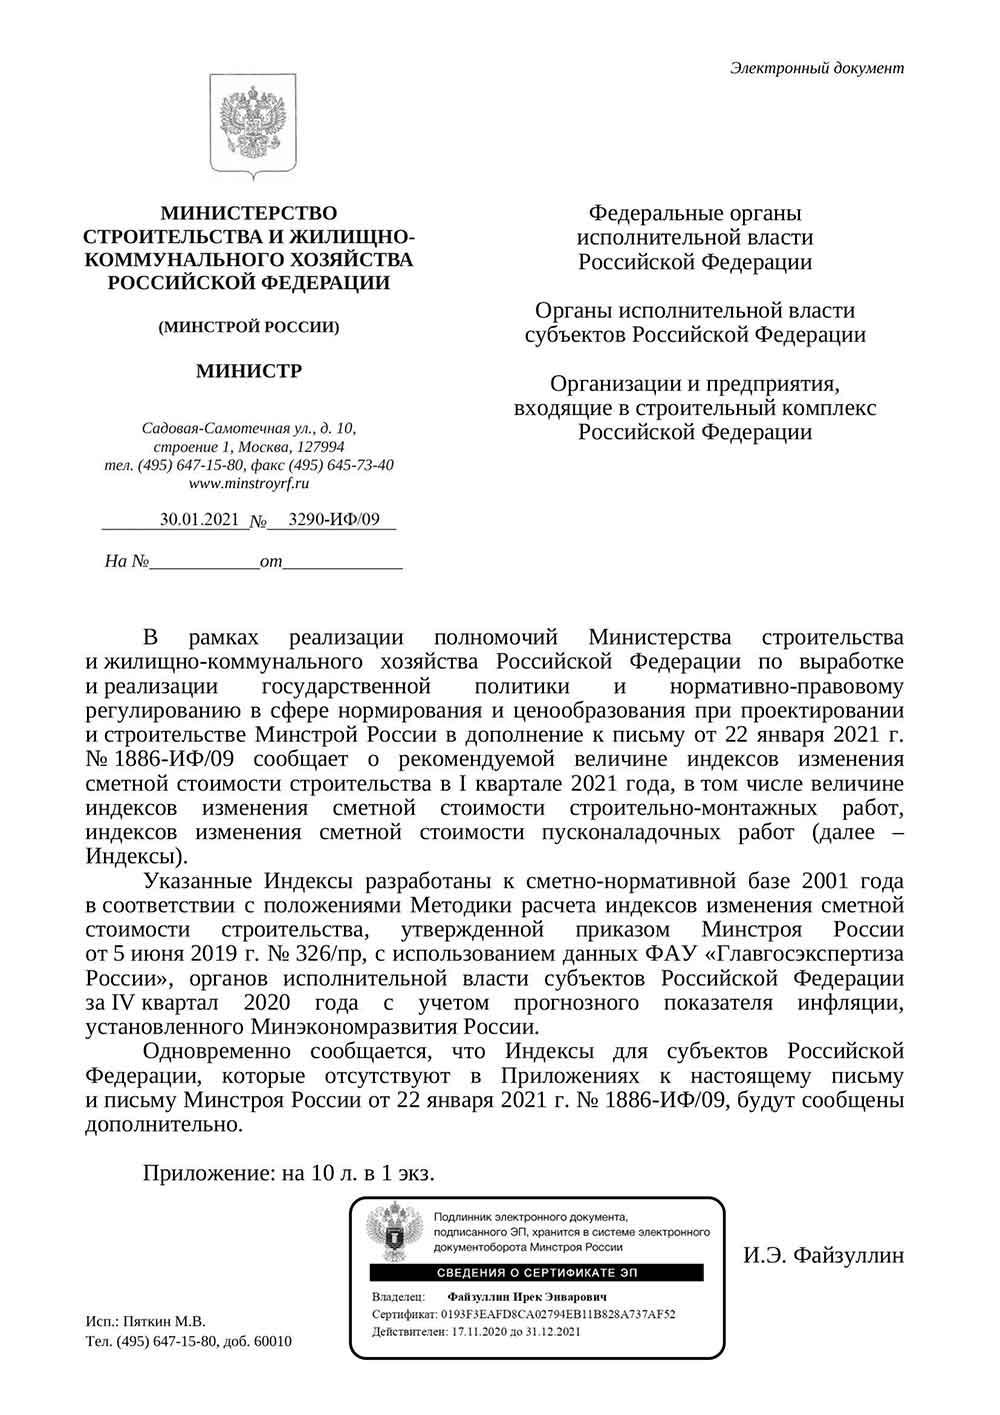 Письмо Минстроя РФ №3290-ИФ/09 от 30.01.2021 г.